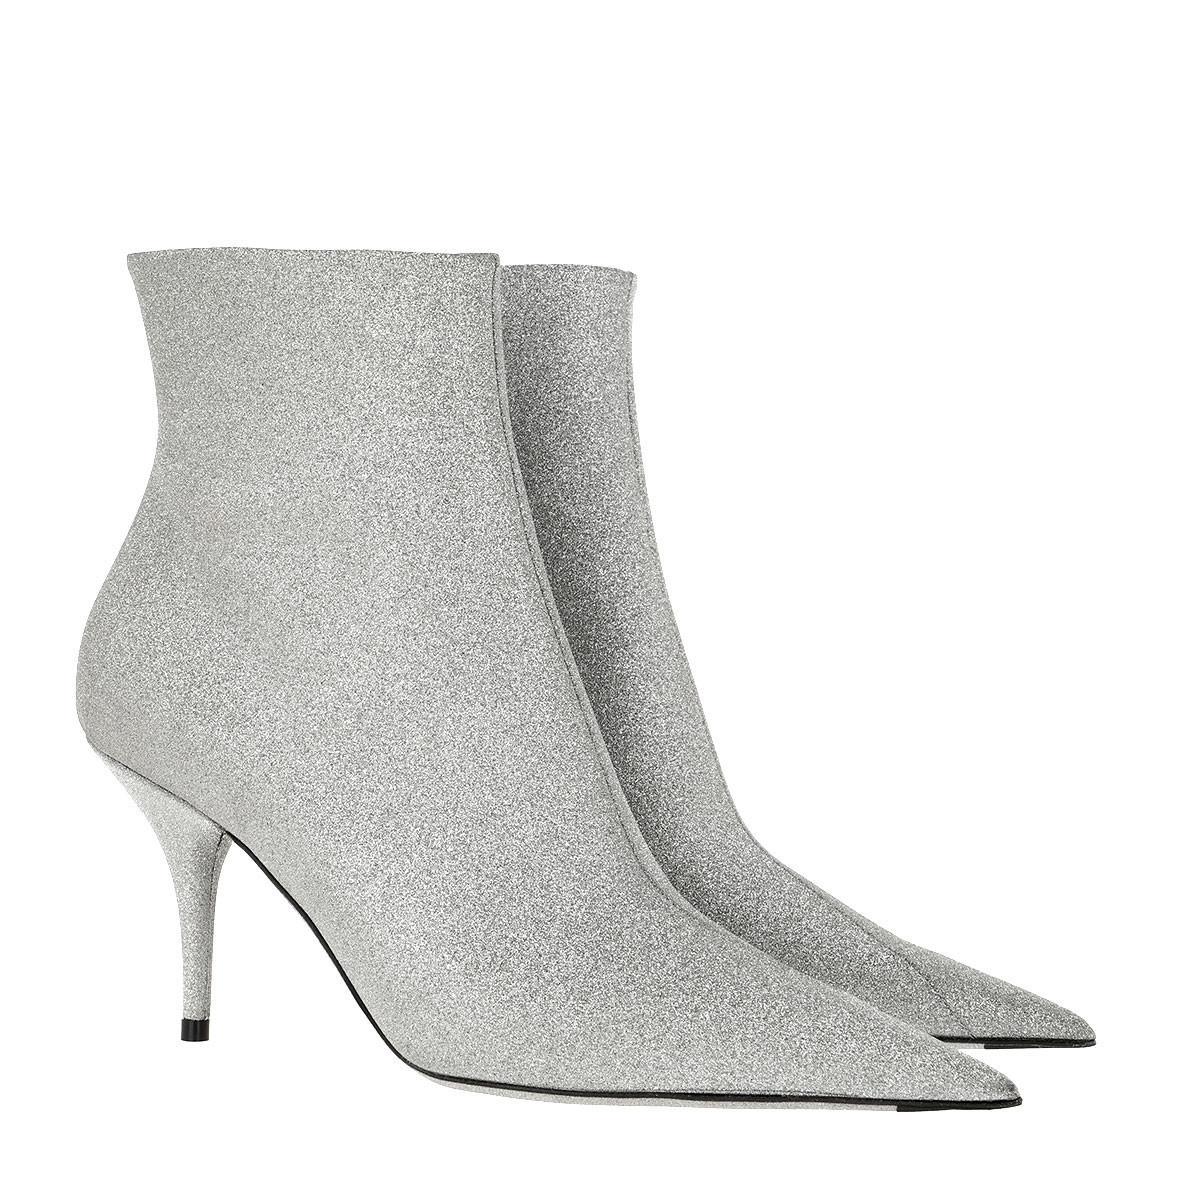 Glitter Ankle Boot Silver in Metallic